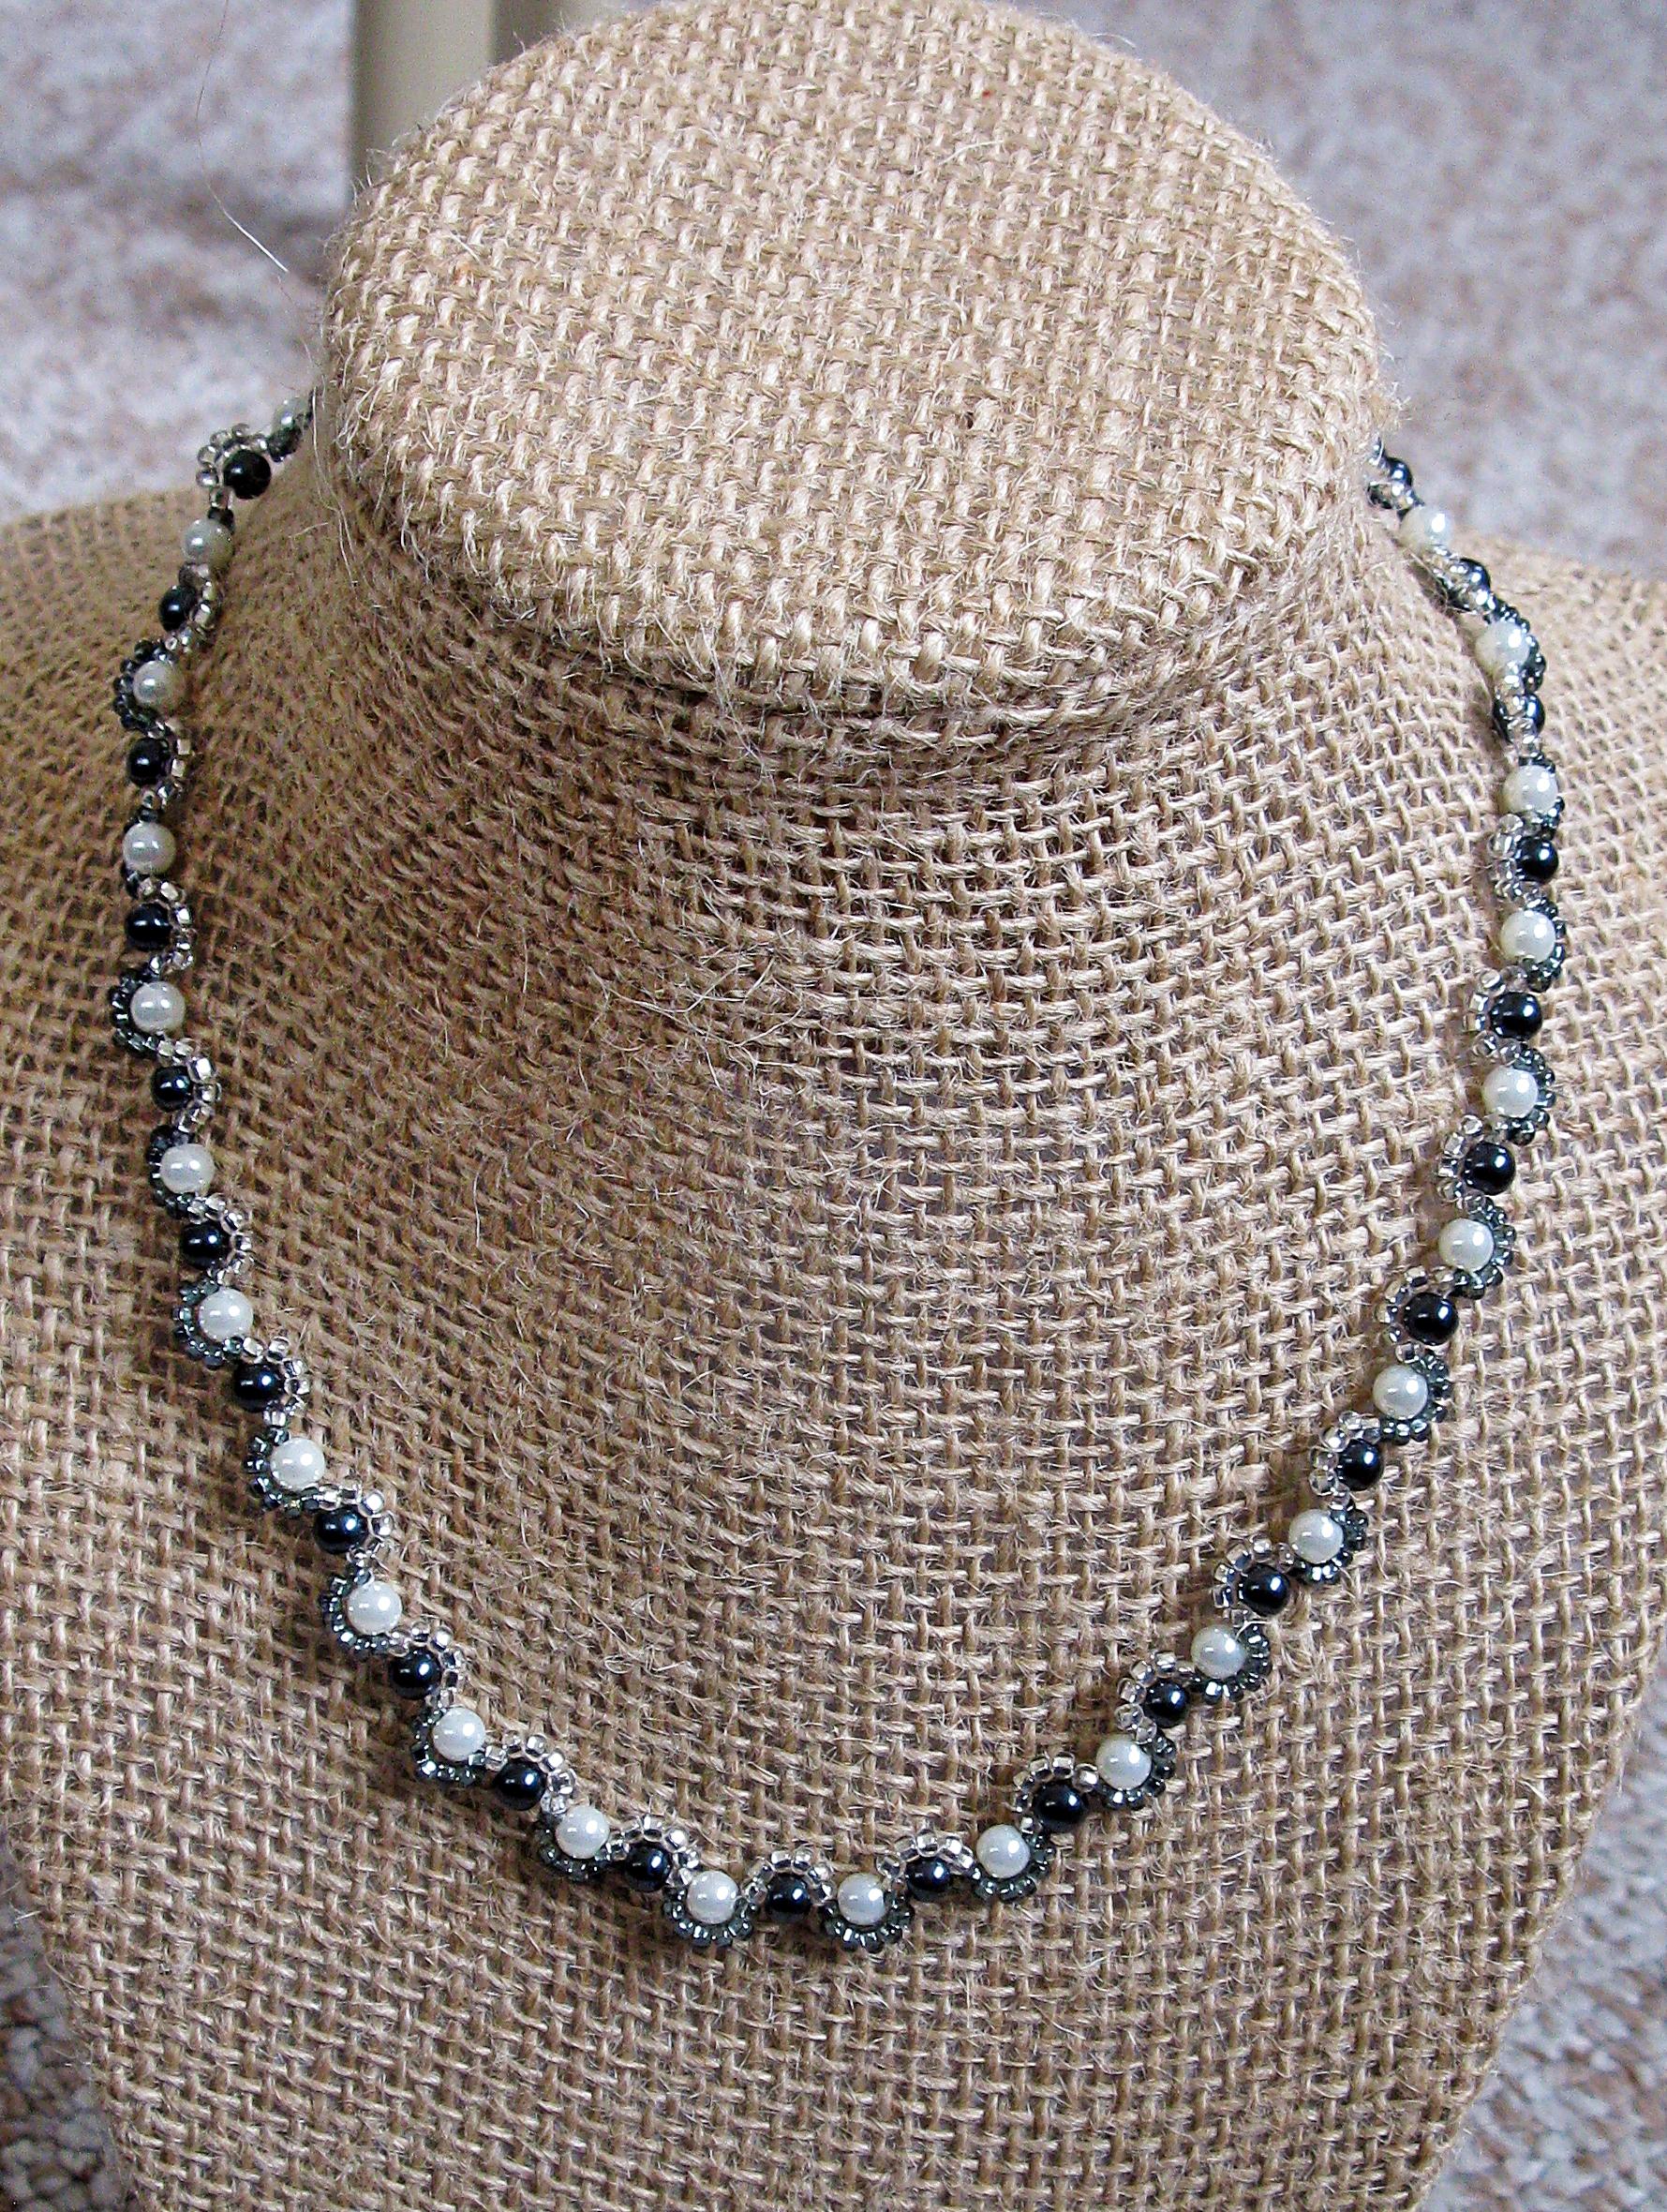 Harlequin pearls